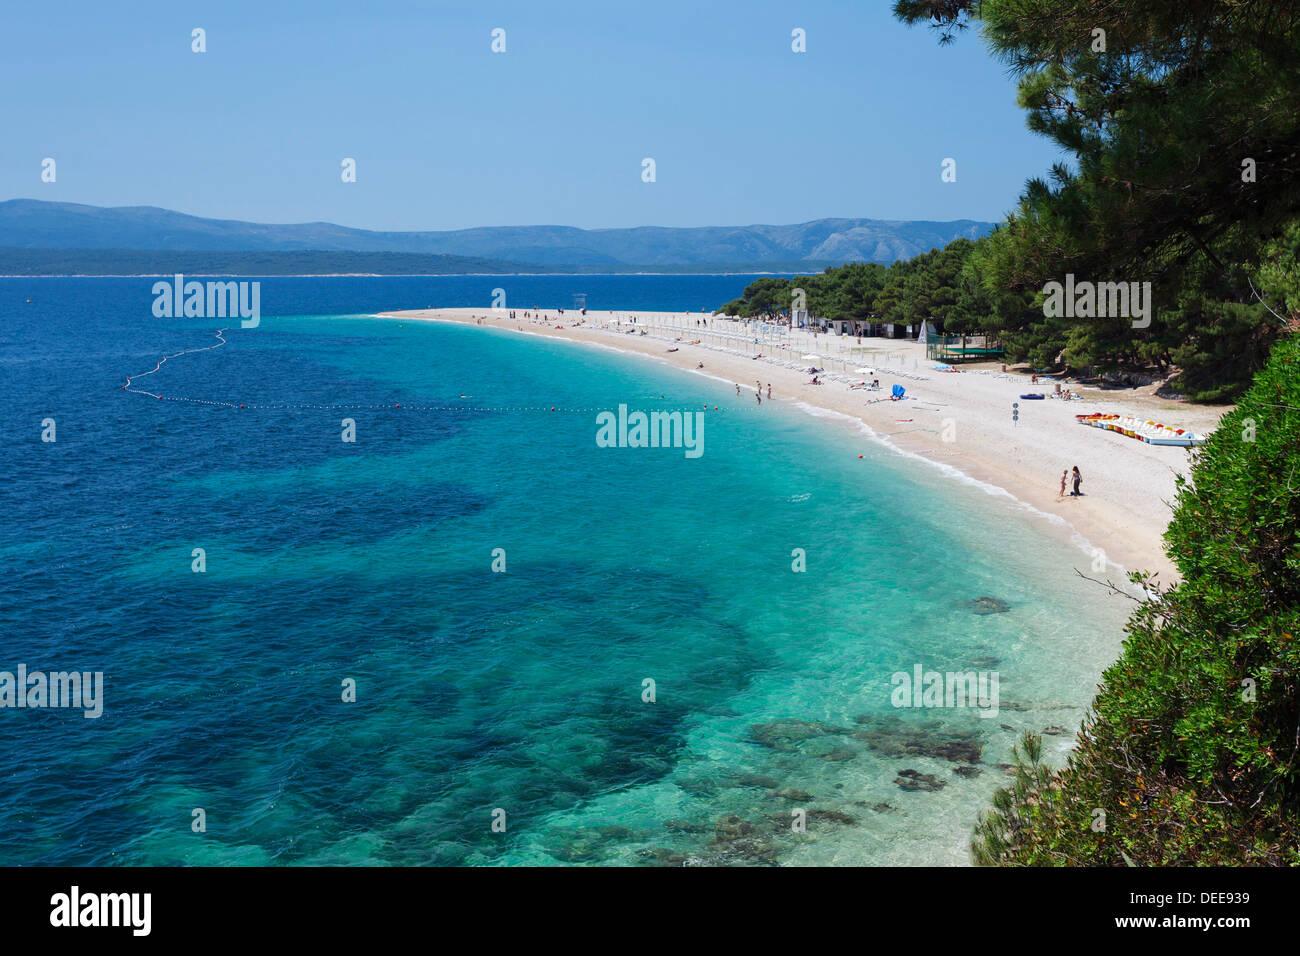 Beach, Zlatni Rat (Golden Horn) and the island of Hvar in the background, Bol, Brac Island, Dalmatia, Croatia, Europe - Stock Image